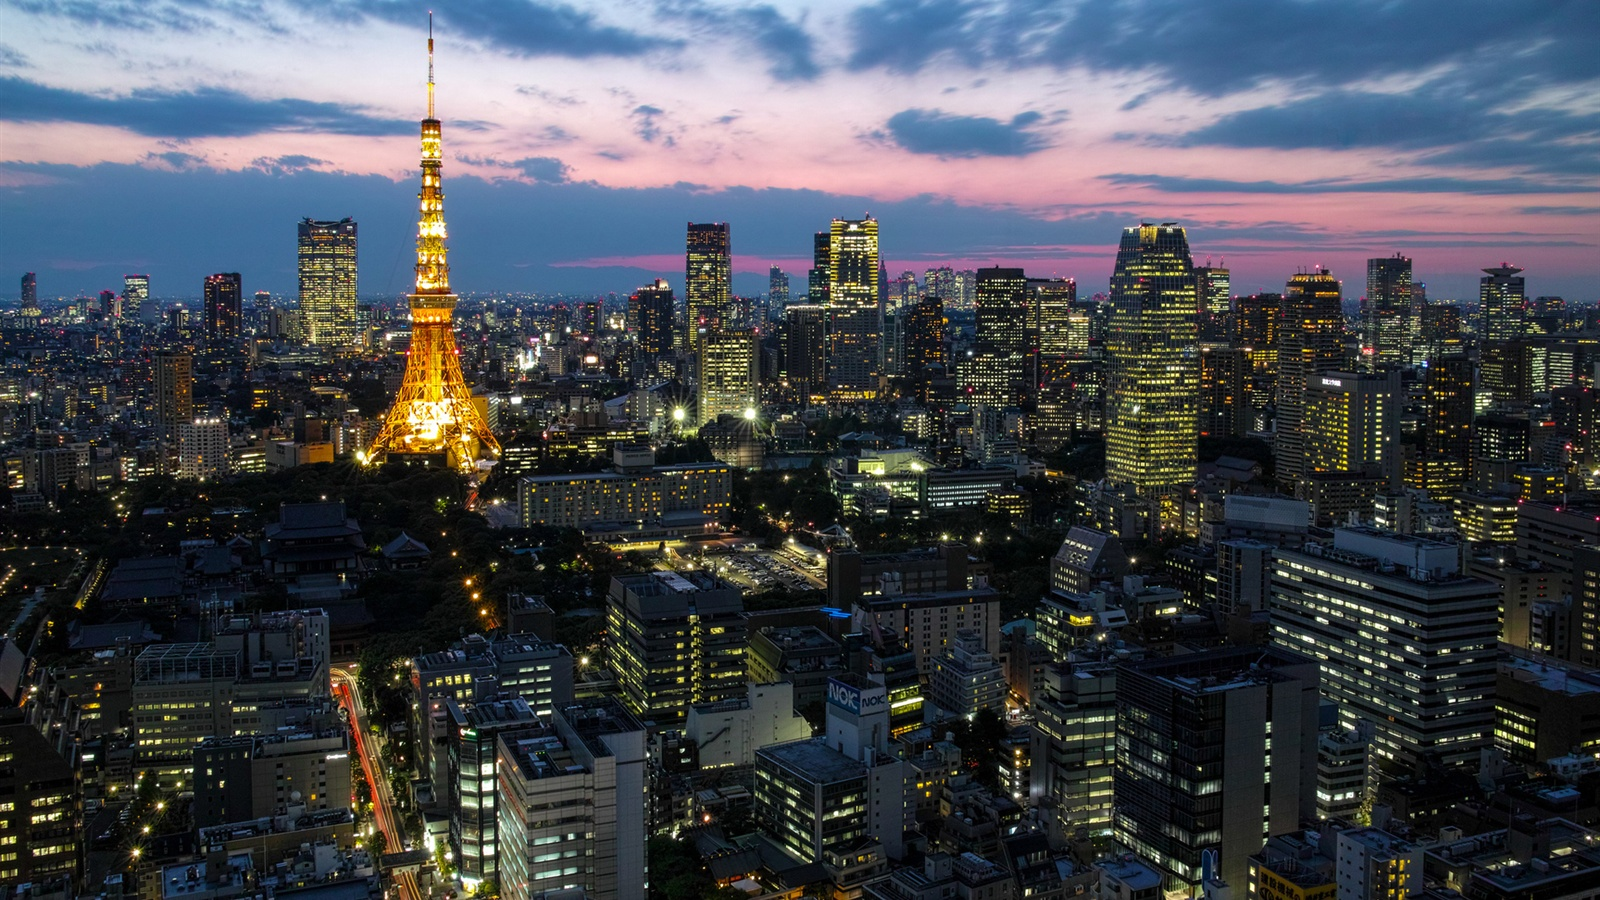 Wallpaper Japan Capital Tokyo City Lights Tower Houses